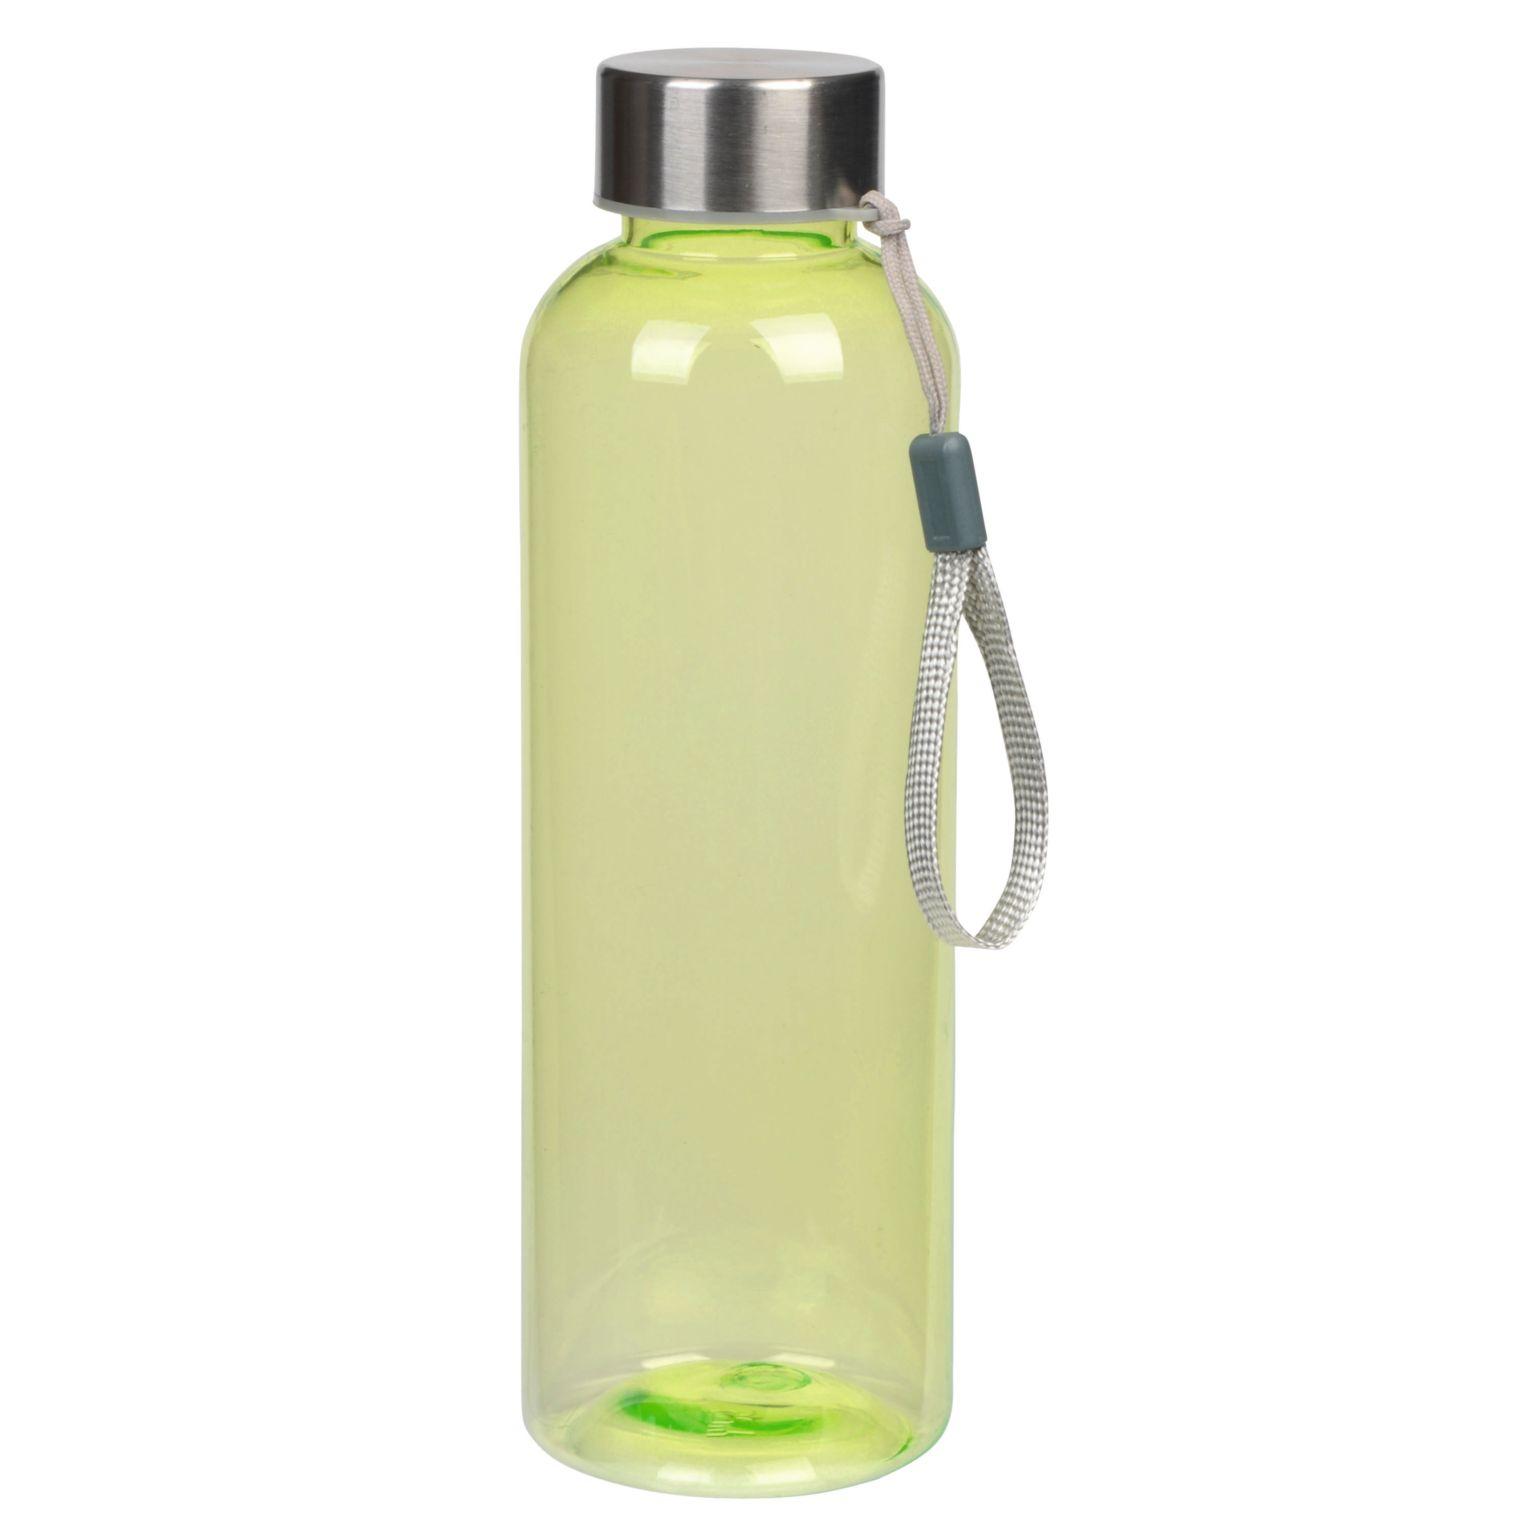 Drinking bottle PLAINLY